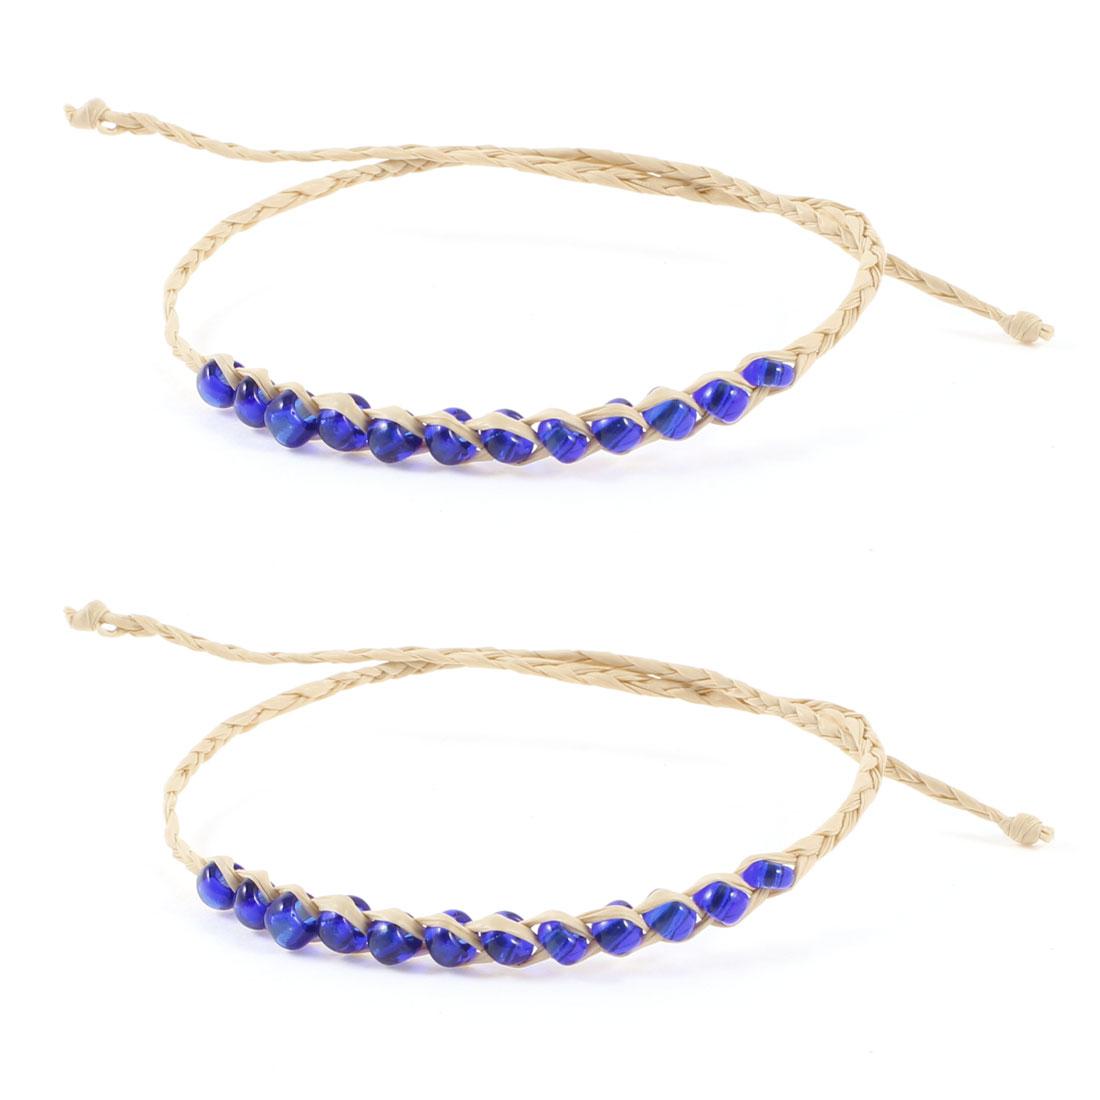 Beige Royal Blue Plastic Beads Detailing Self Tie Straw Wrist Bracelet 2 Pcs